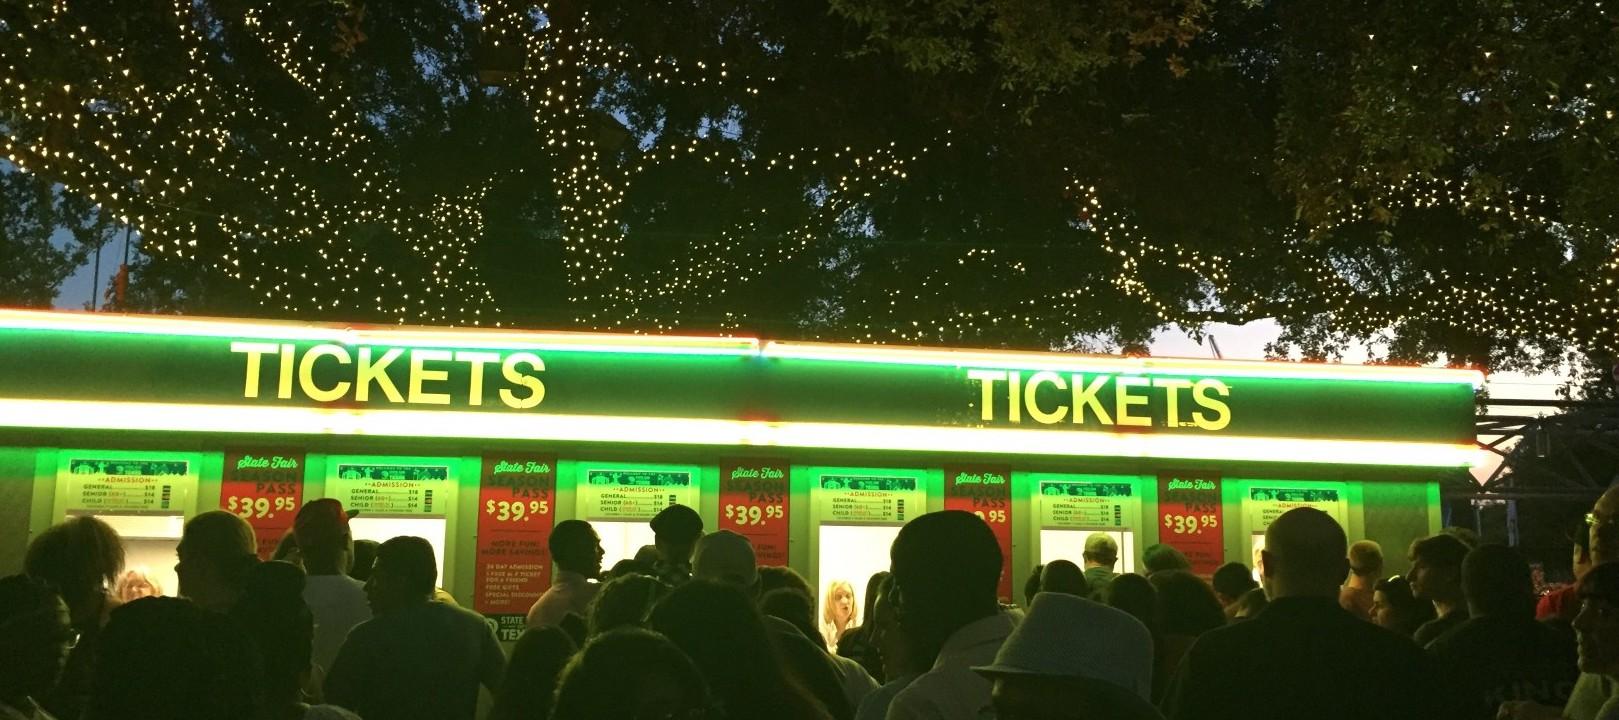 Double ticket sales in 2020